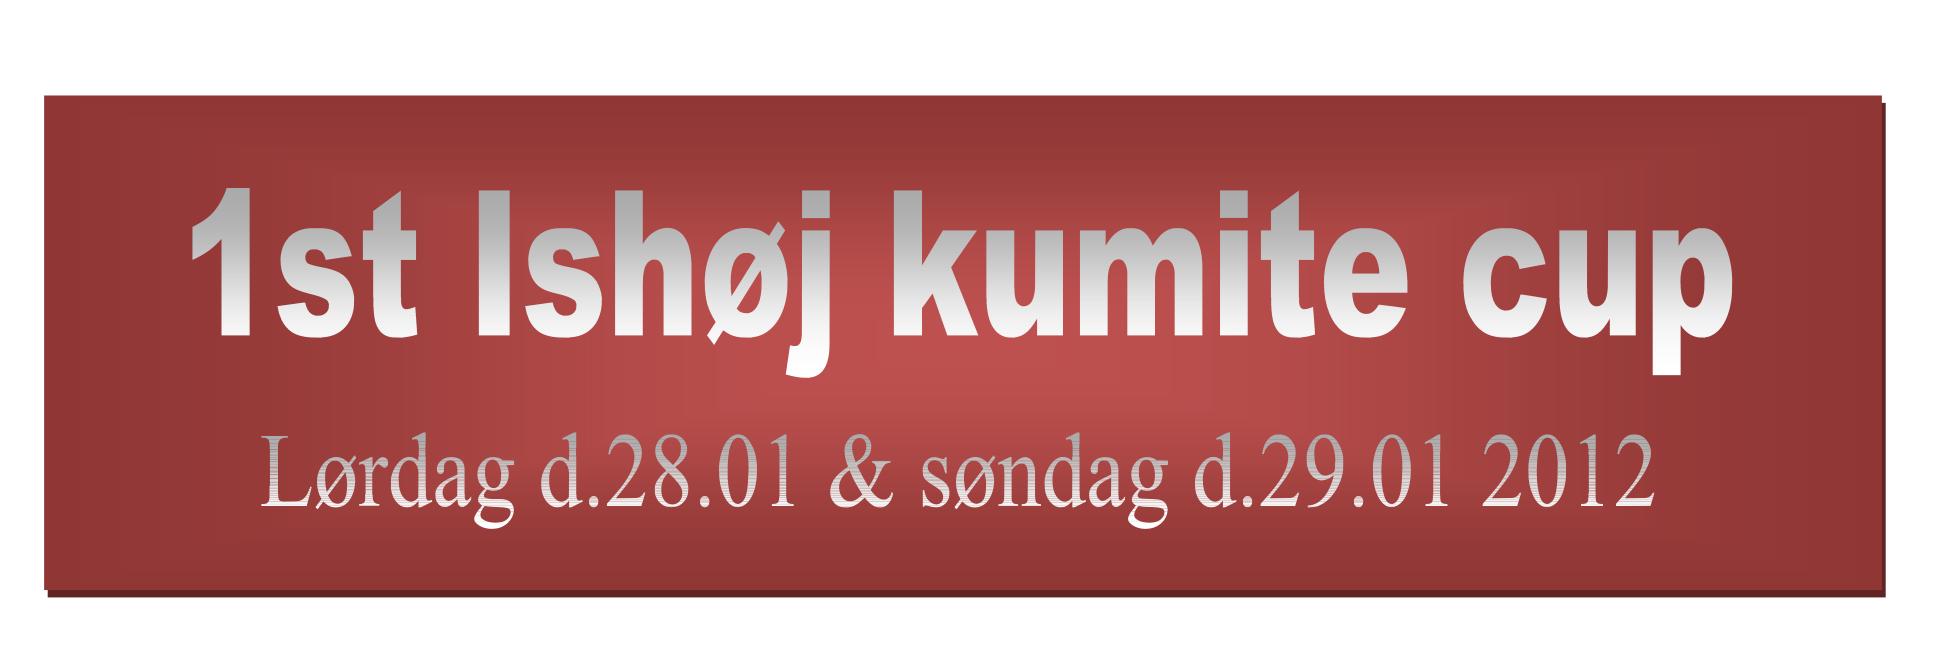 Ishøj kumite cup.  28. – 29. Januar 2012